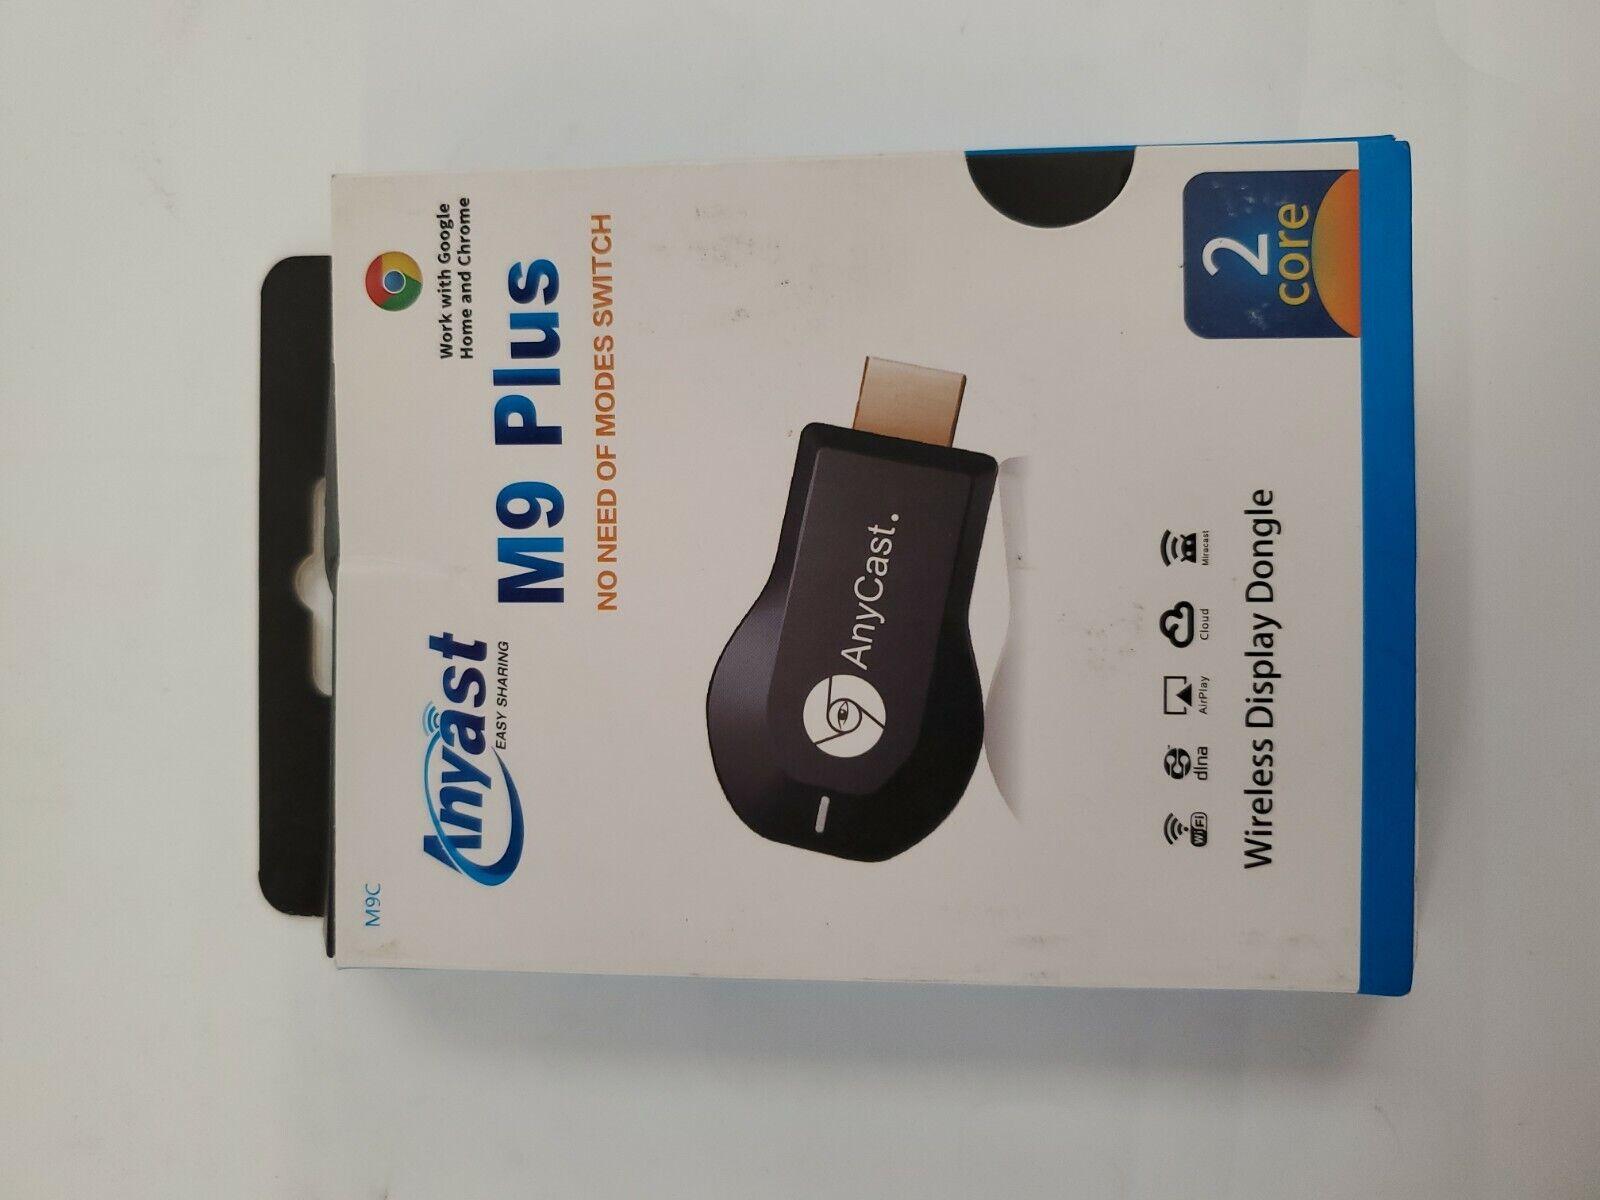 Anycast M9 Plus HDMI TV Stick 1080P Wireless Wifi Display TV Dongle Empfänger